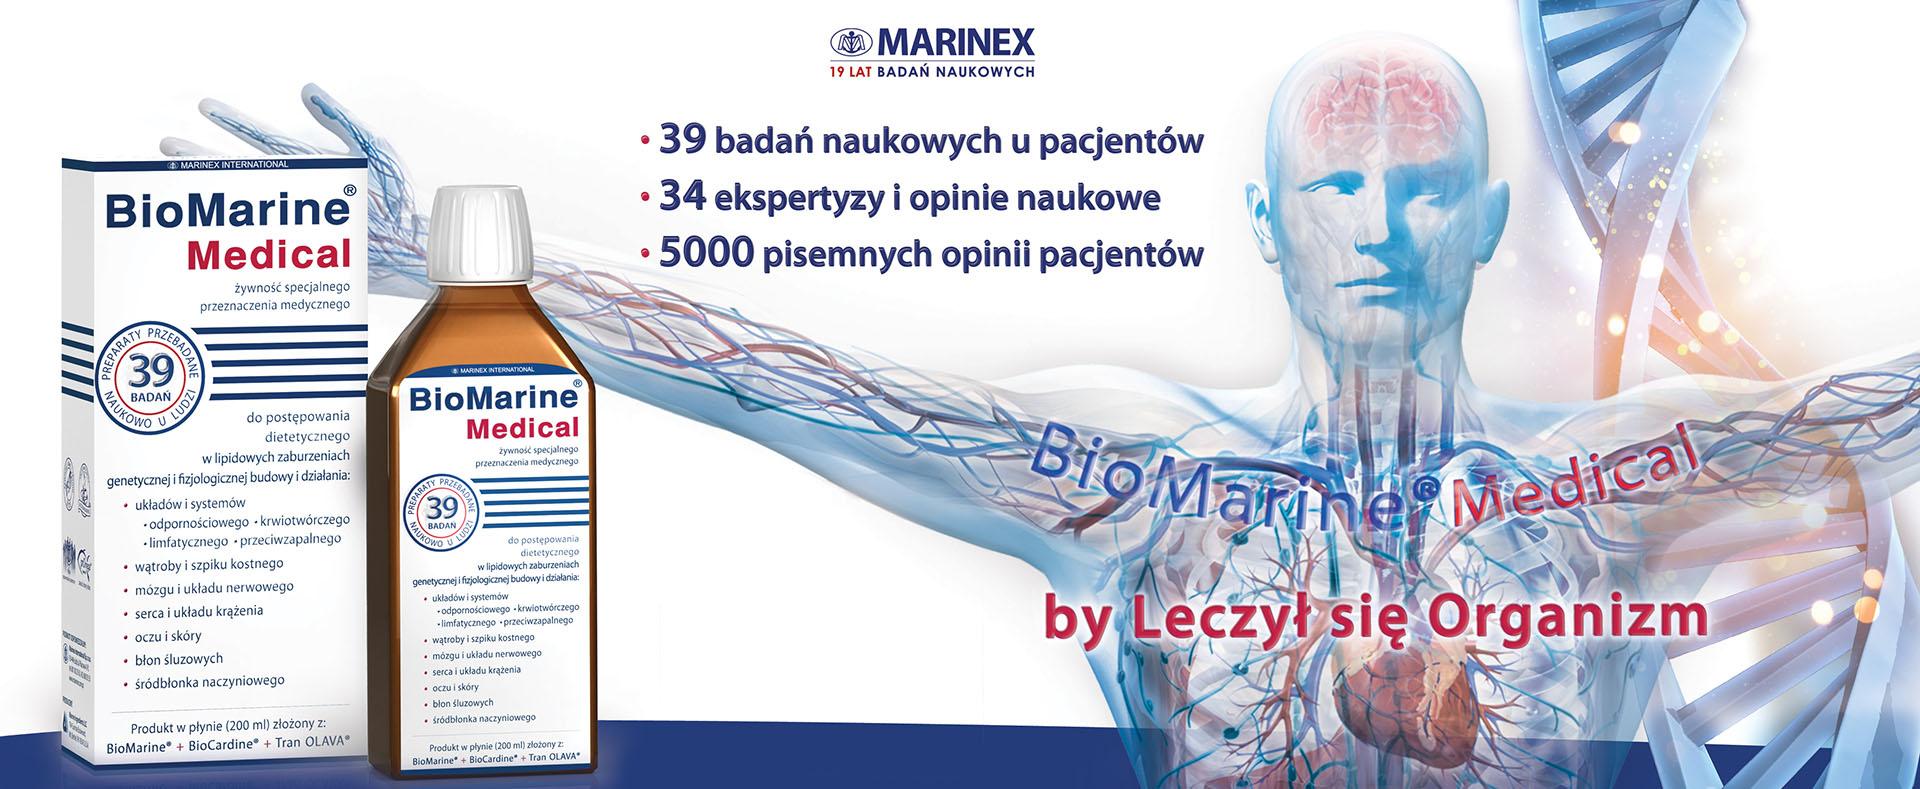 marinex2